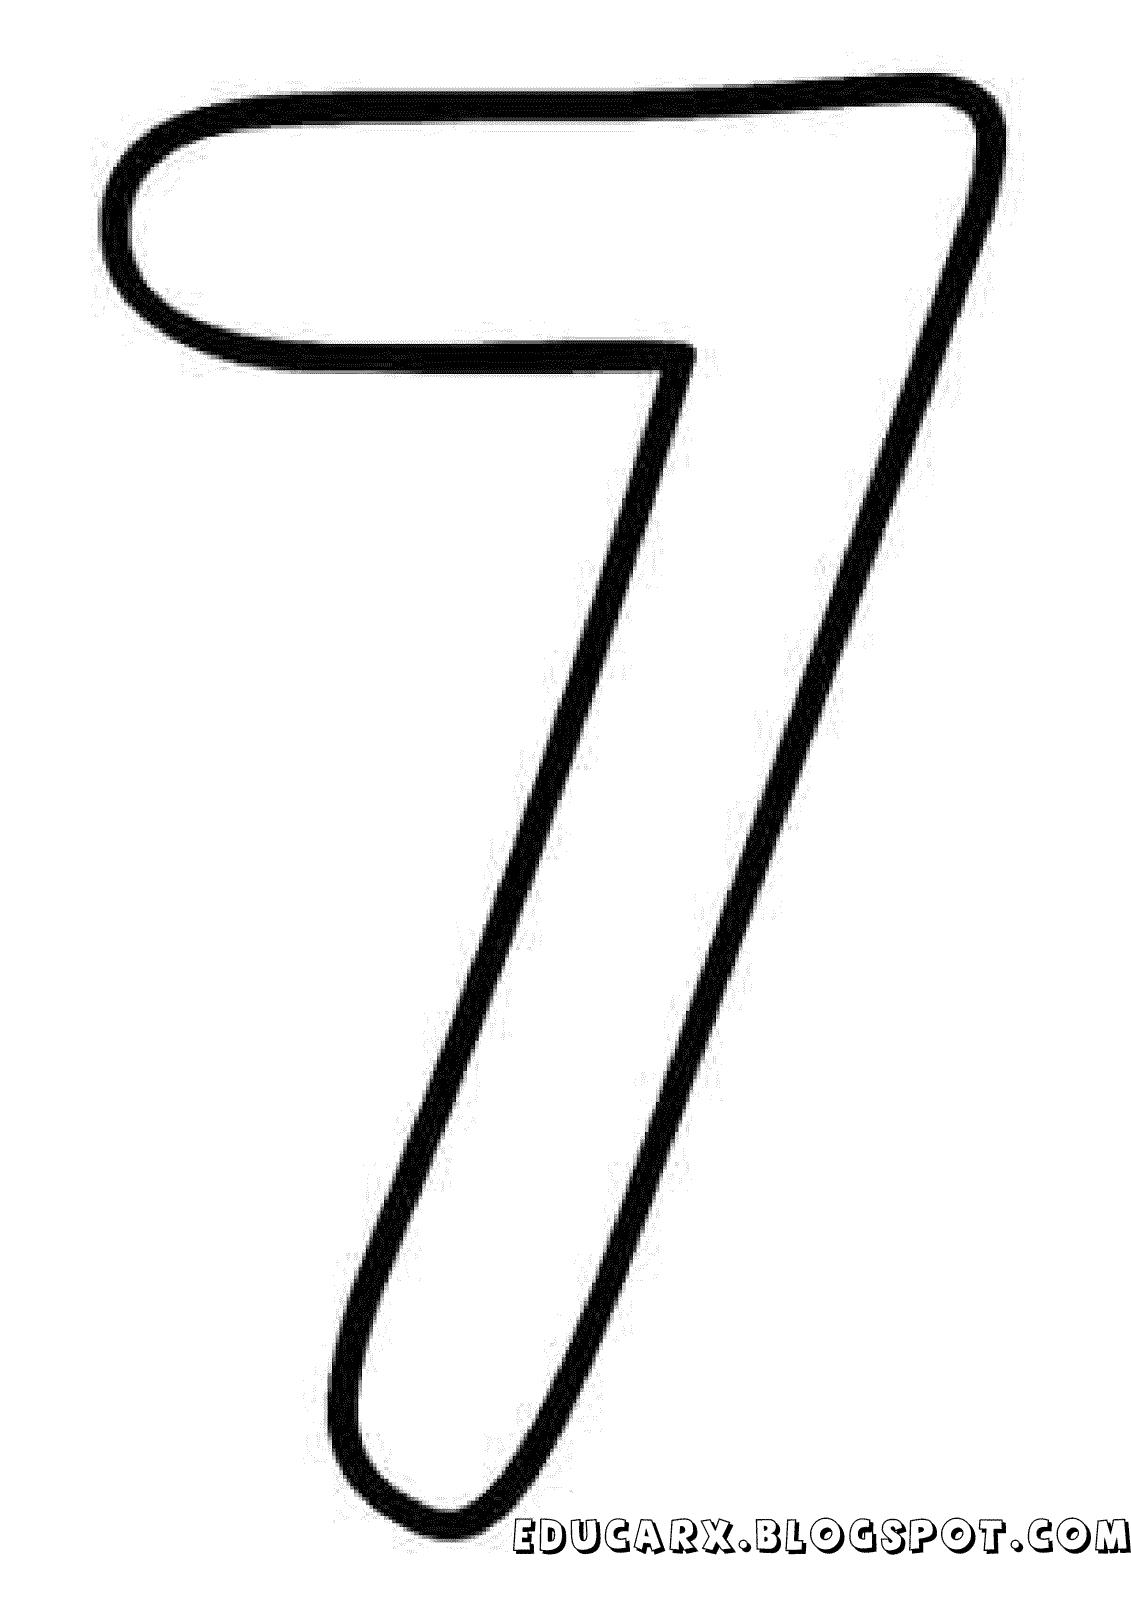 Educar X: Moldes de números